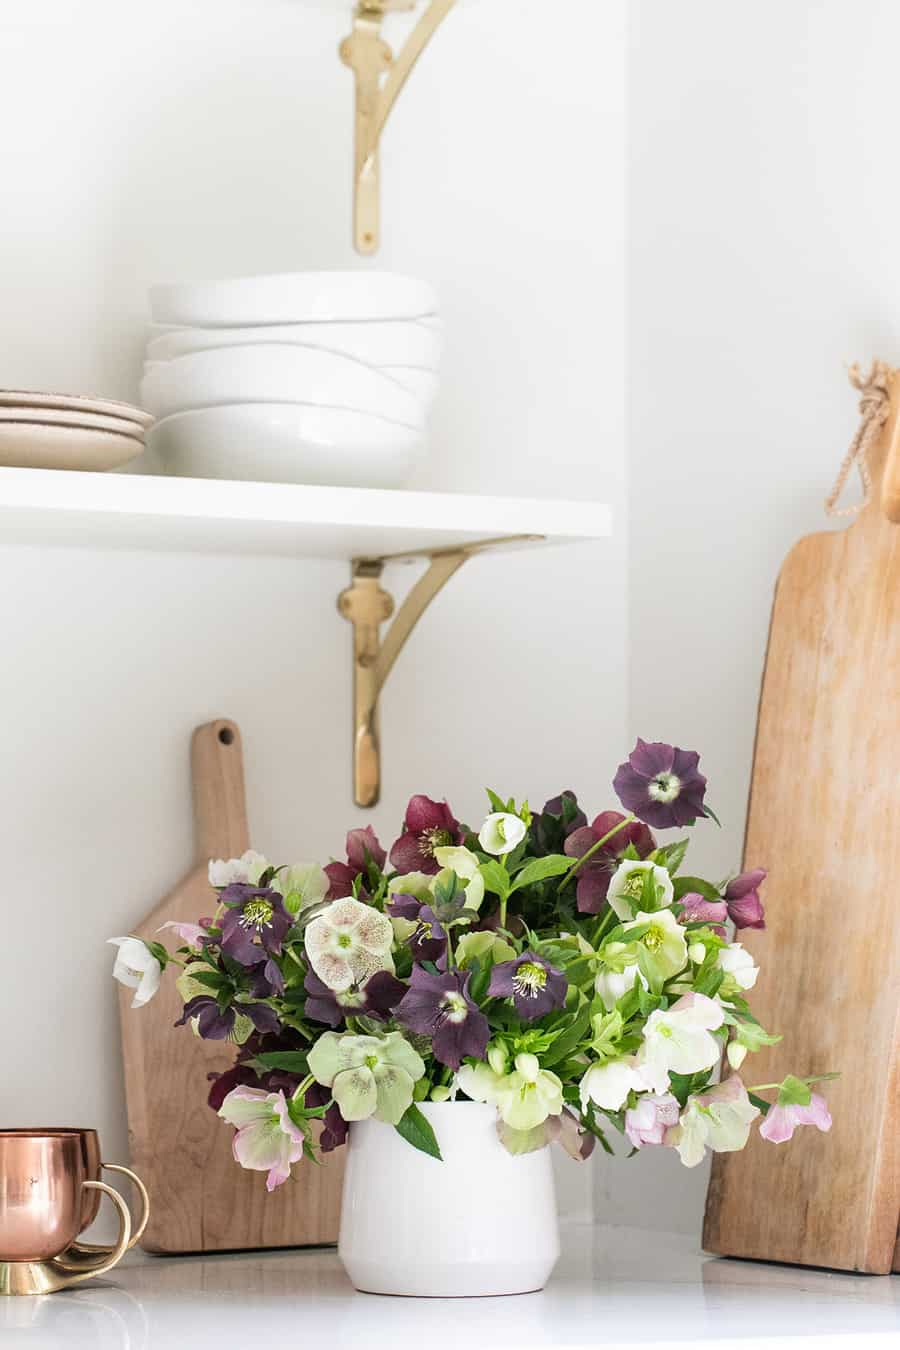 Hellebore in a white vase in a kitchen